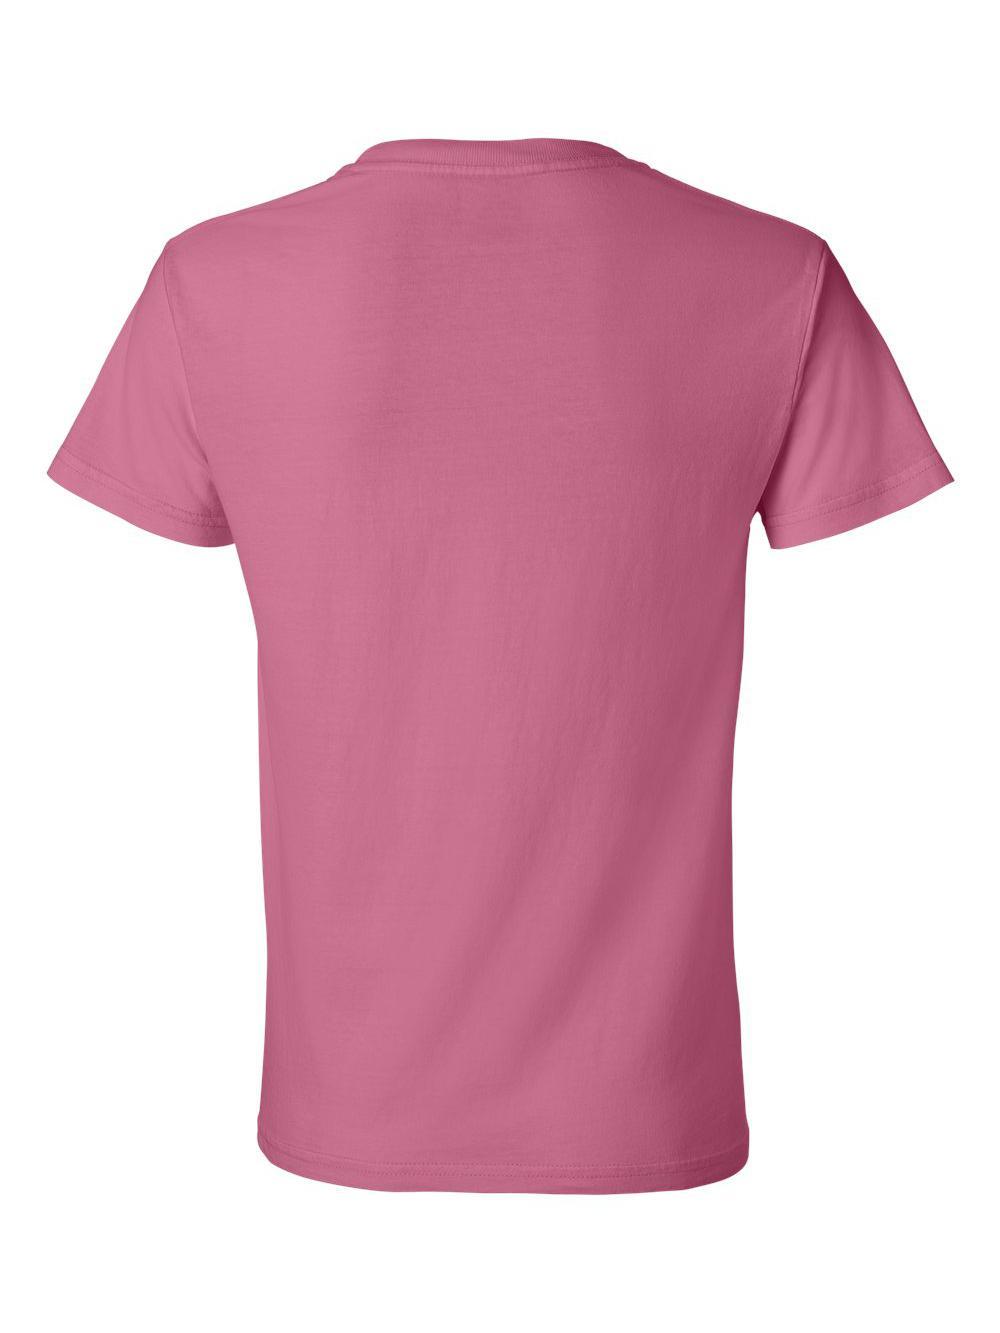 Comfort-Colors-Pigment-Dyed-Ringspun-Women-039-s-Short-Sleeve-T-Shirt-3333 thumbnail 15